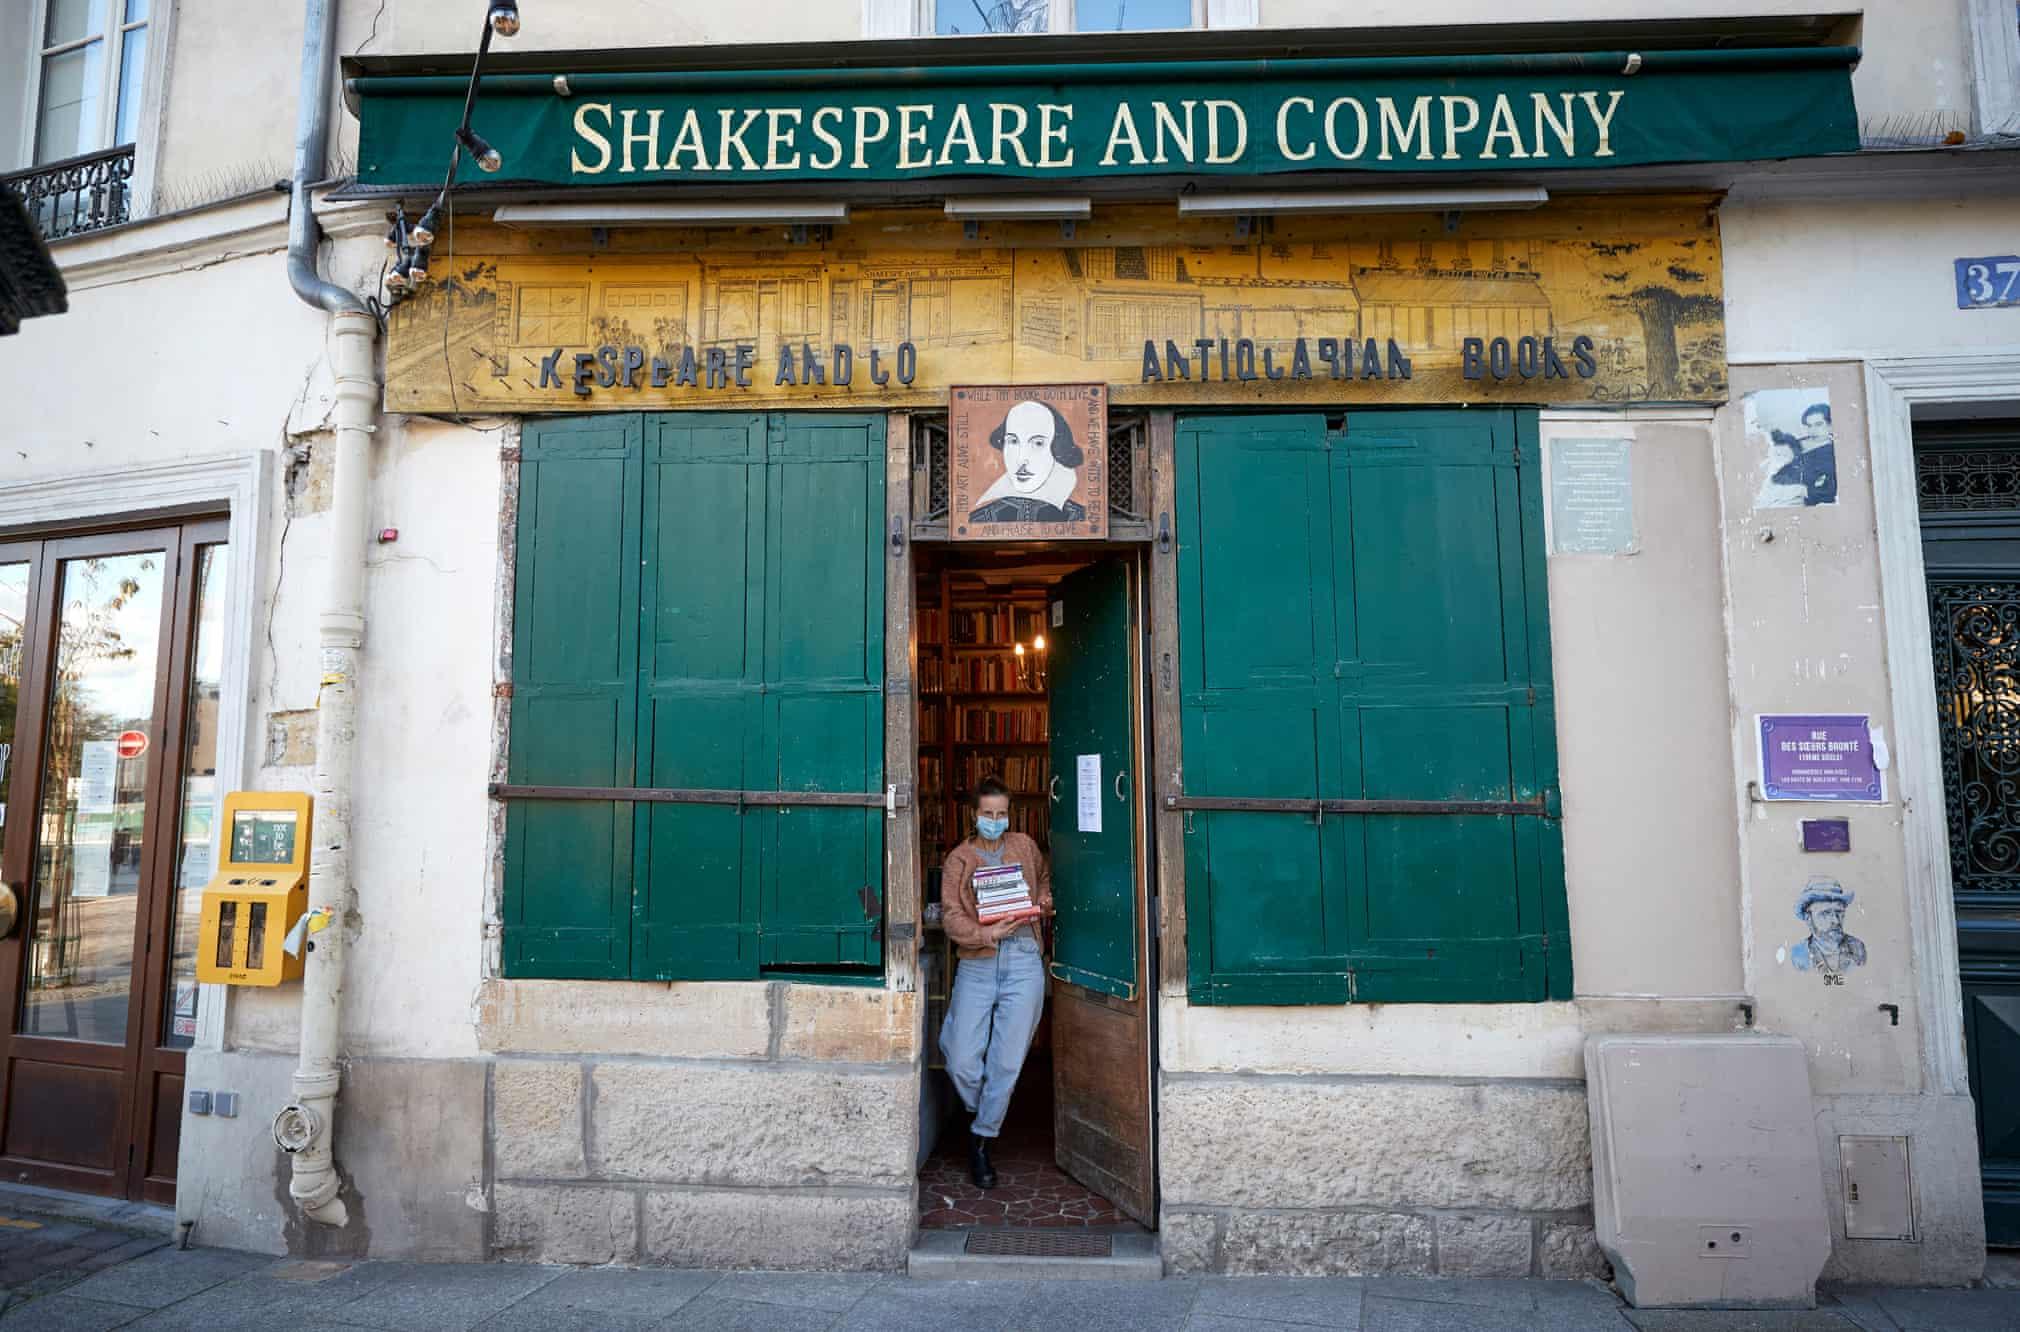 Shakespeare and Company: Το βιβλιοπωλείο αντιμέτωπο με τον κορονοϊό